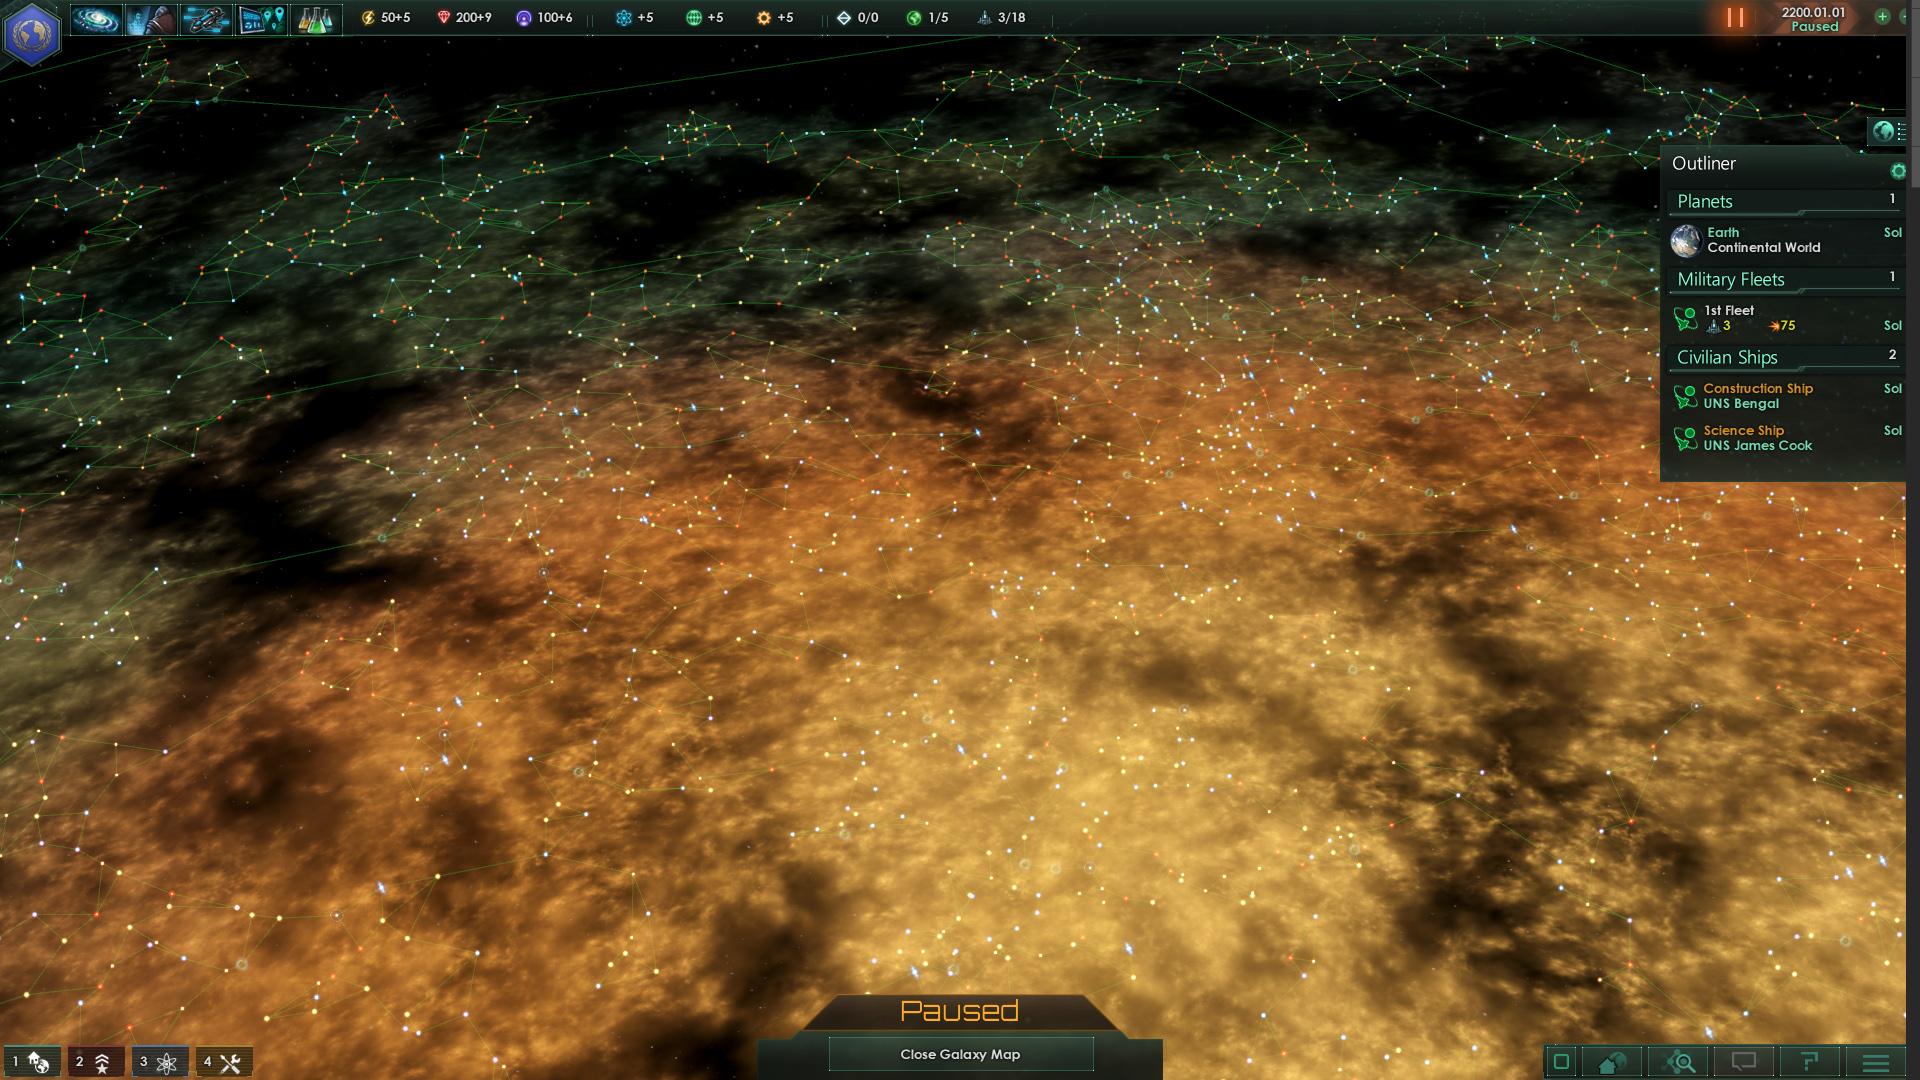 stellaris_dev_diary_31_01_20160502_galaxy_test.jpg